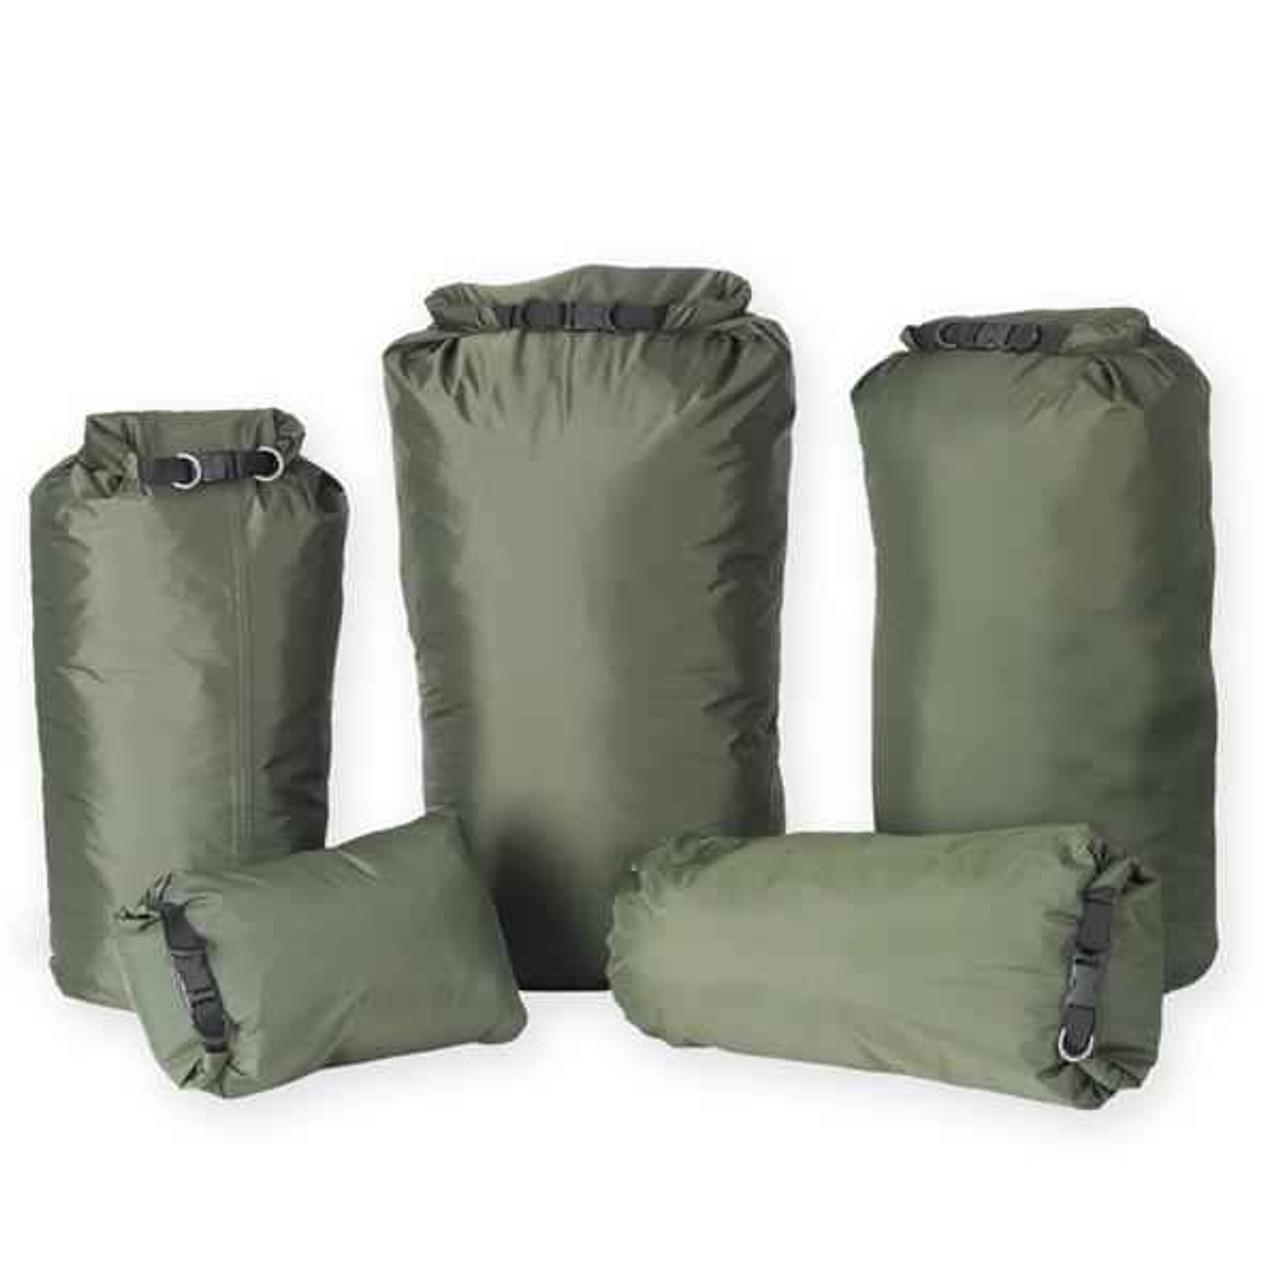 Pro Force Dri-Sak Waterproof Bag - Large, Olive